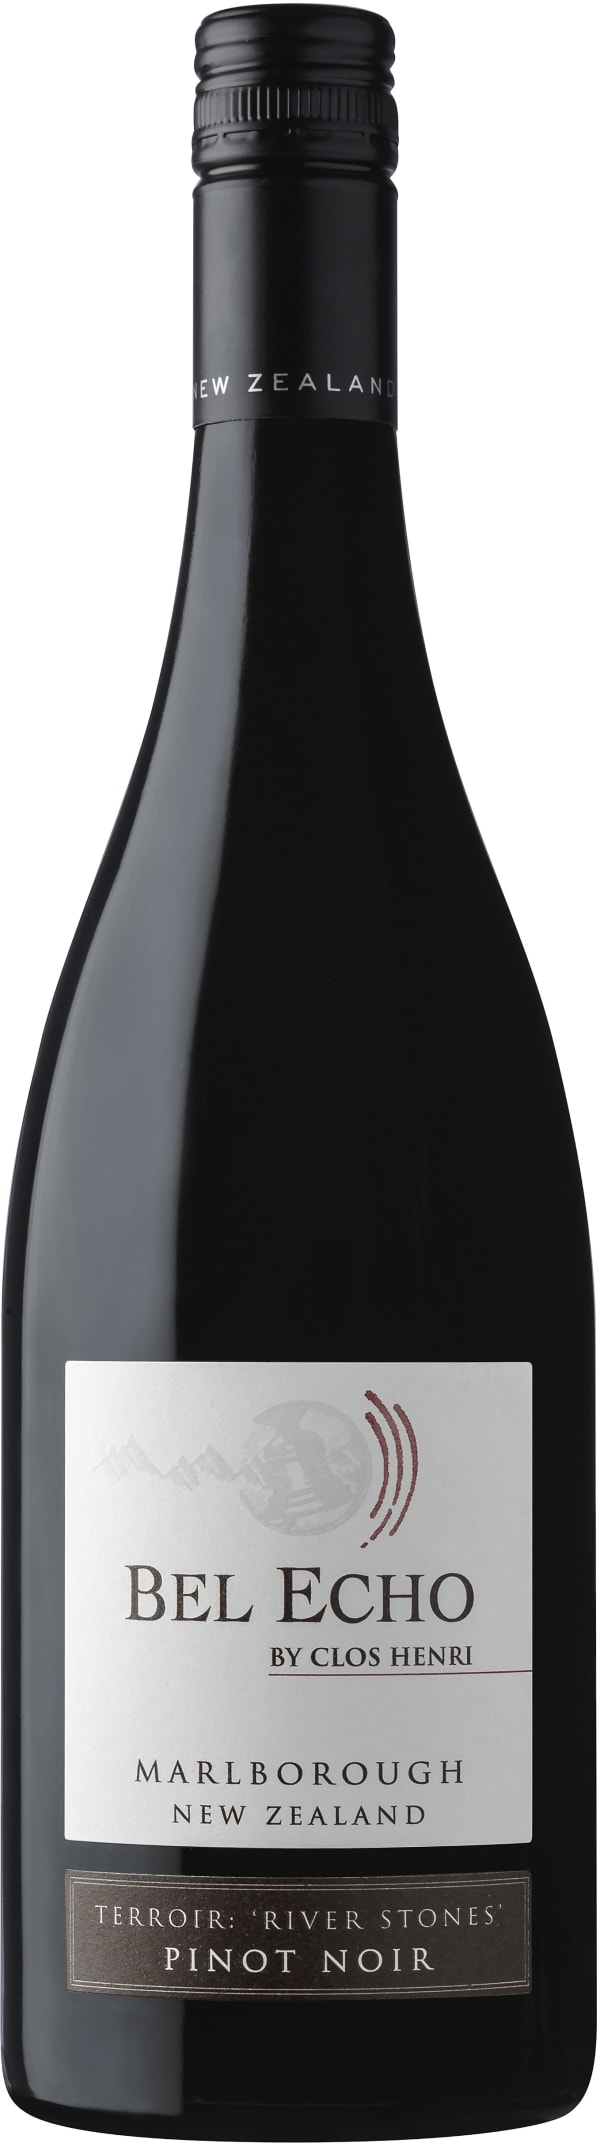 Bel Echo Pinot Noir by Clos Henri 2017